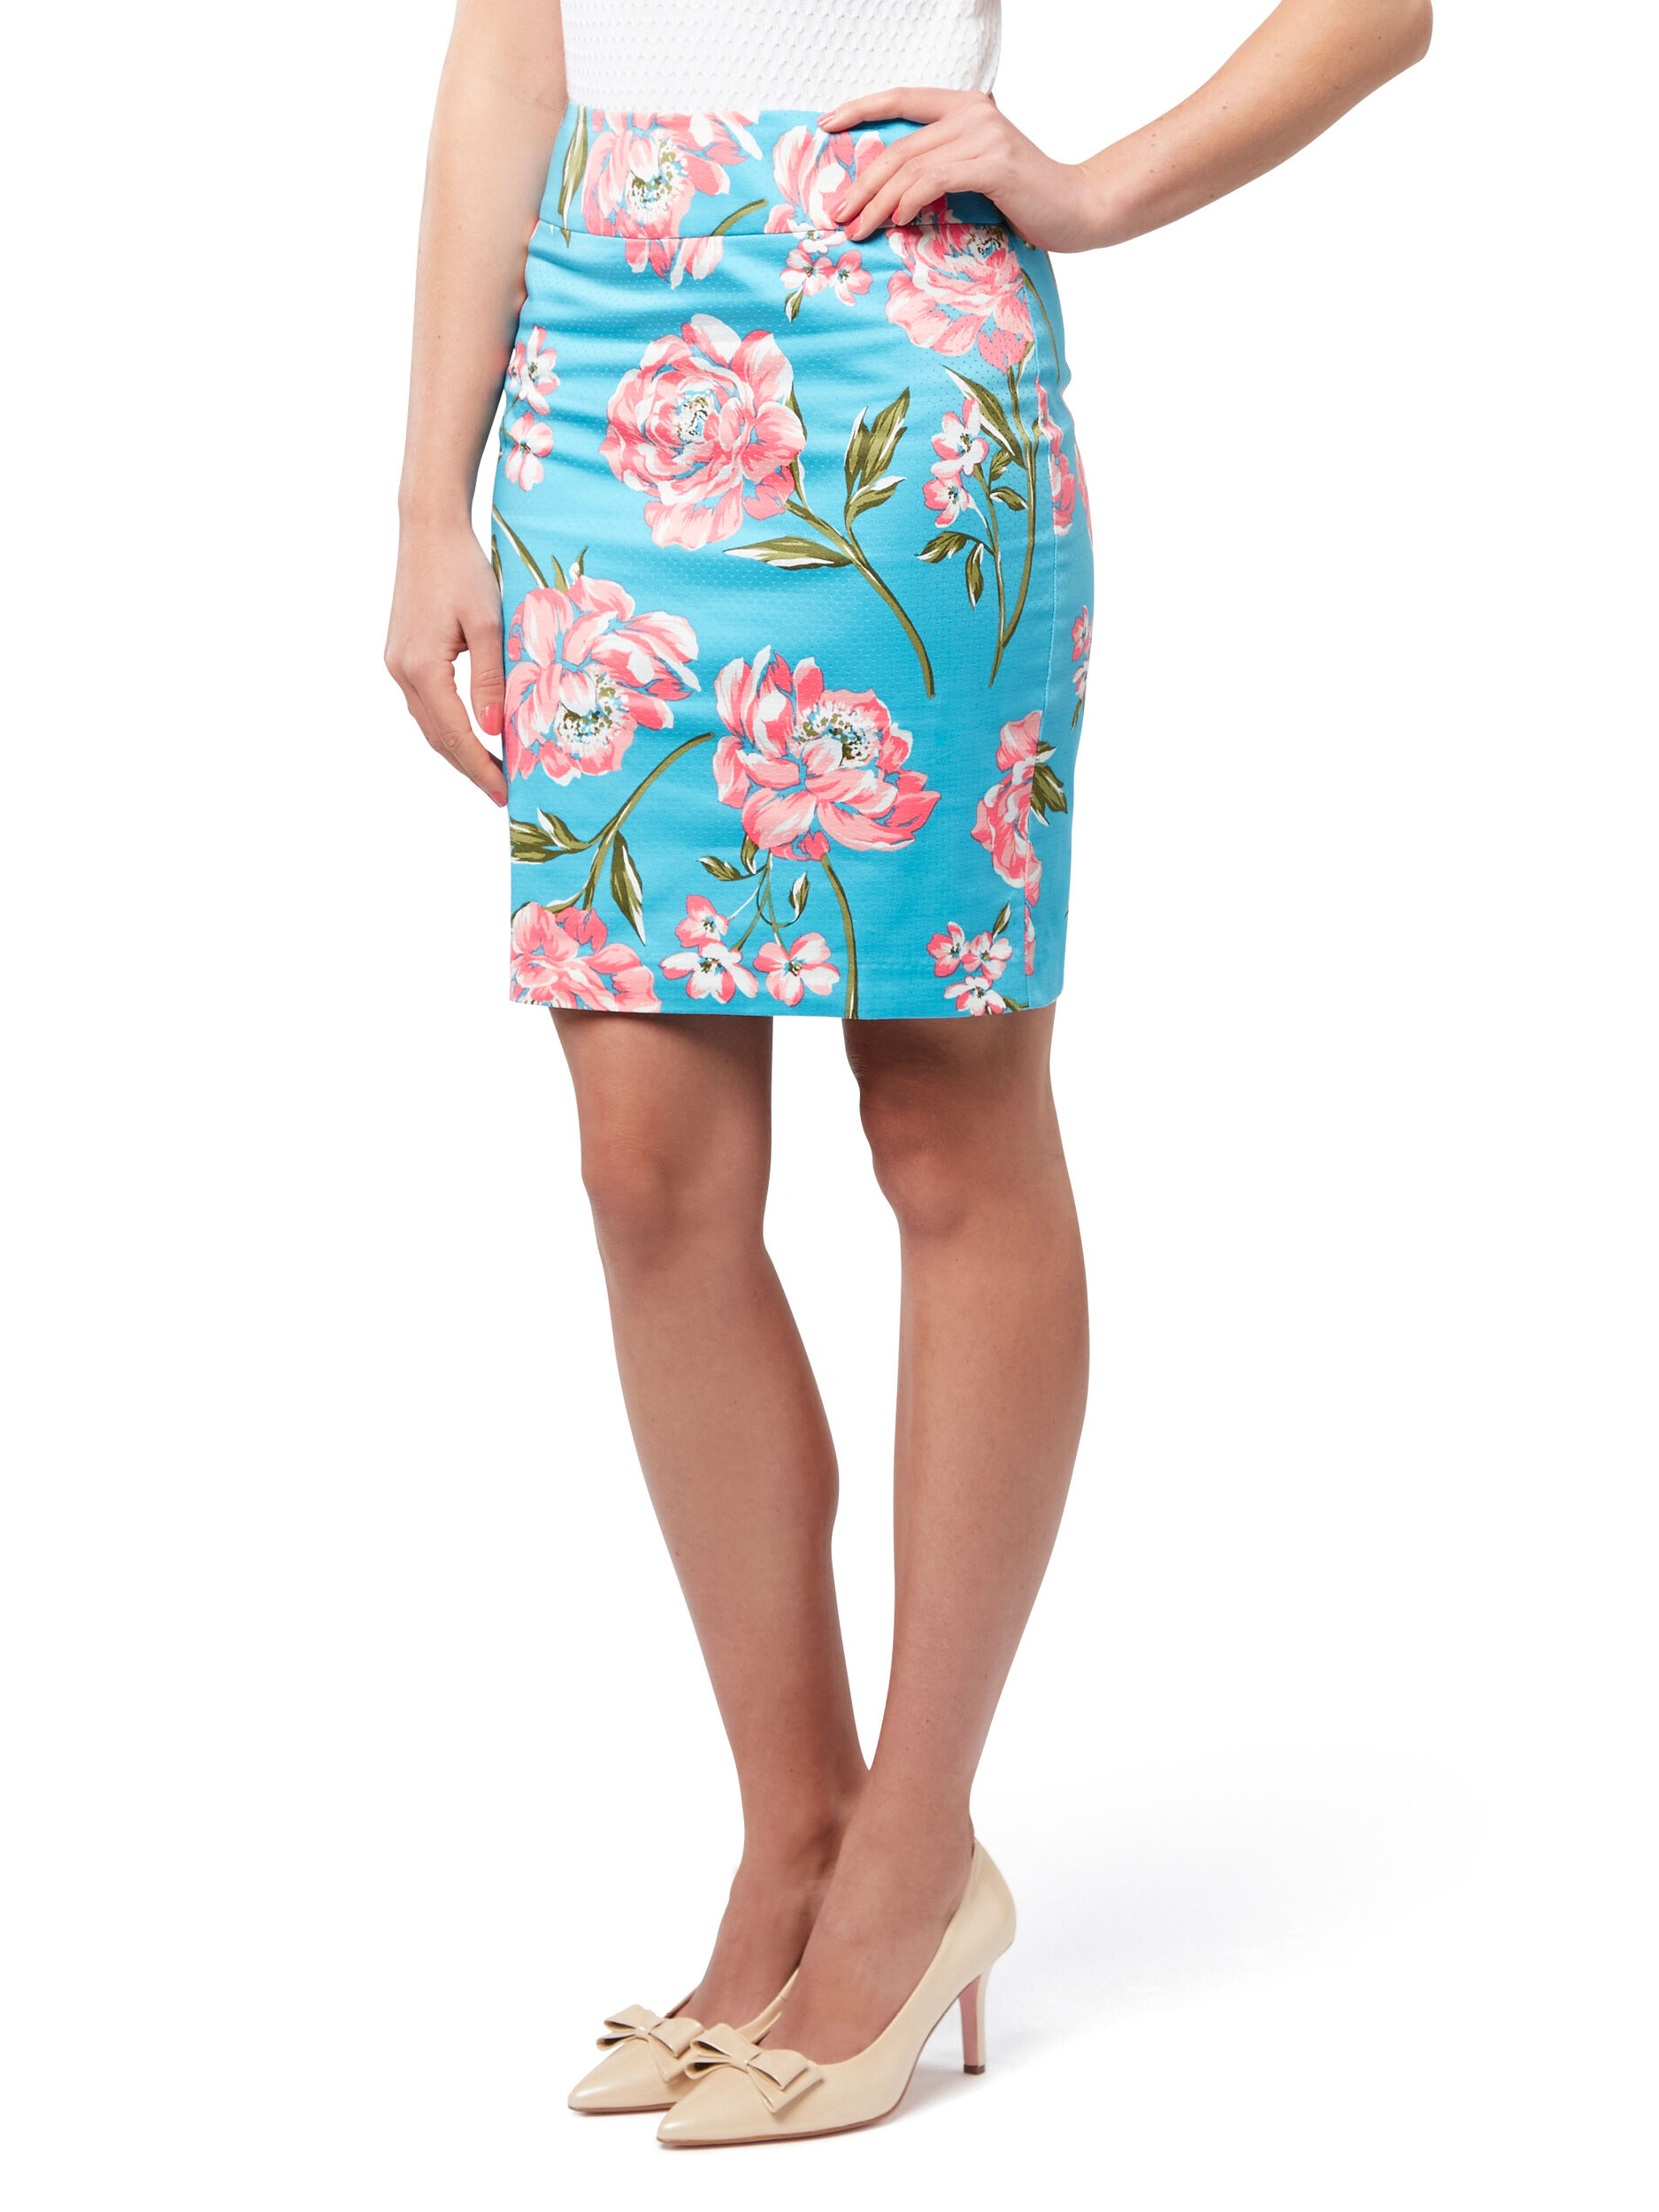 Yes Darling Skirt